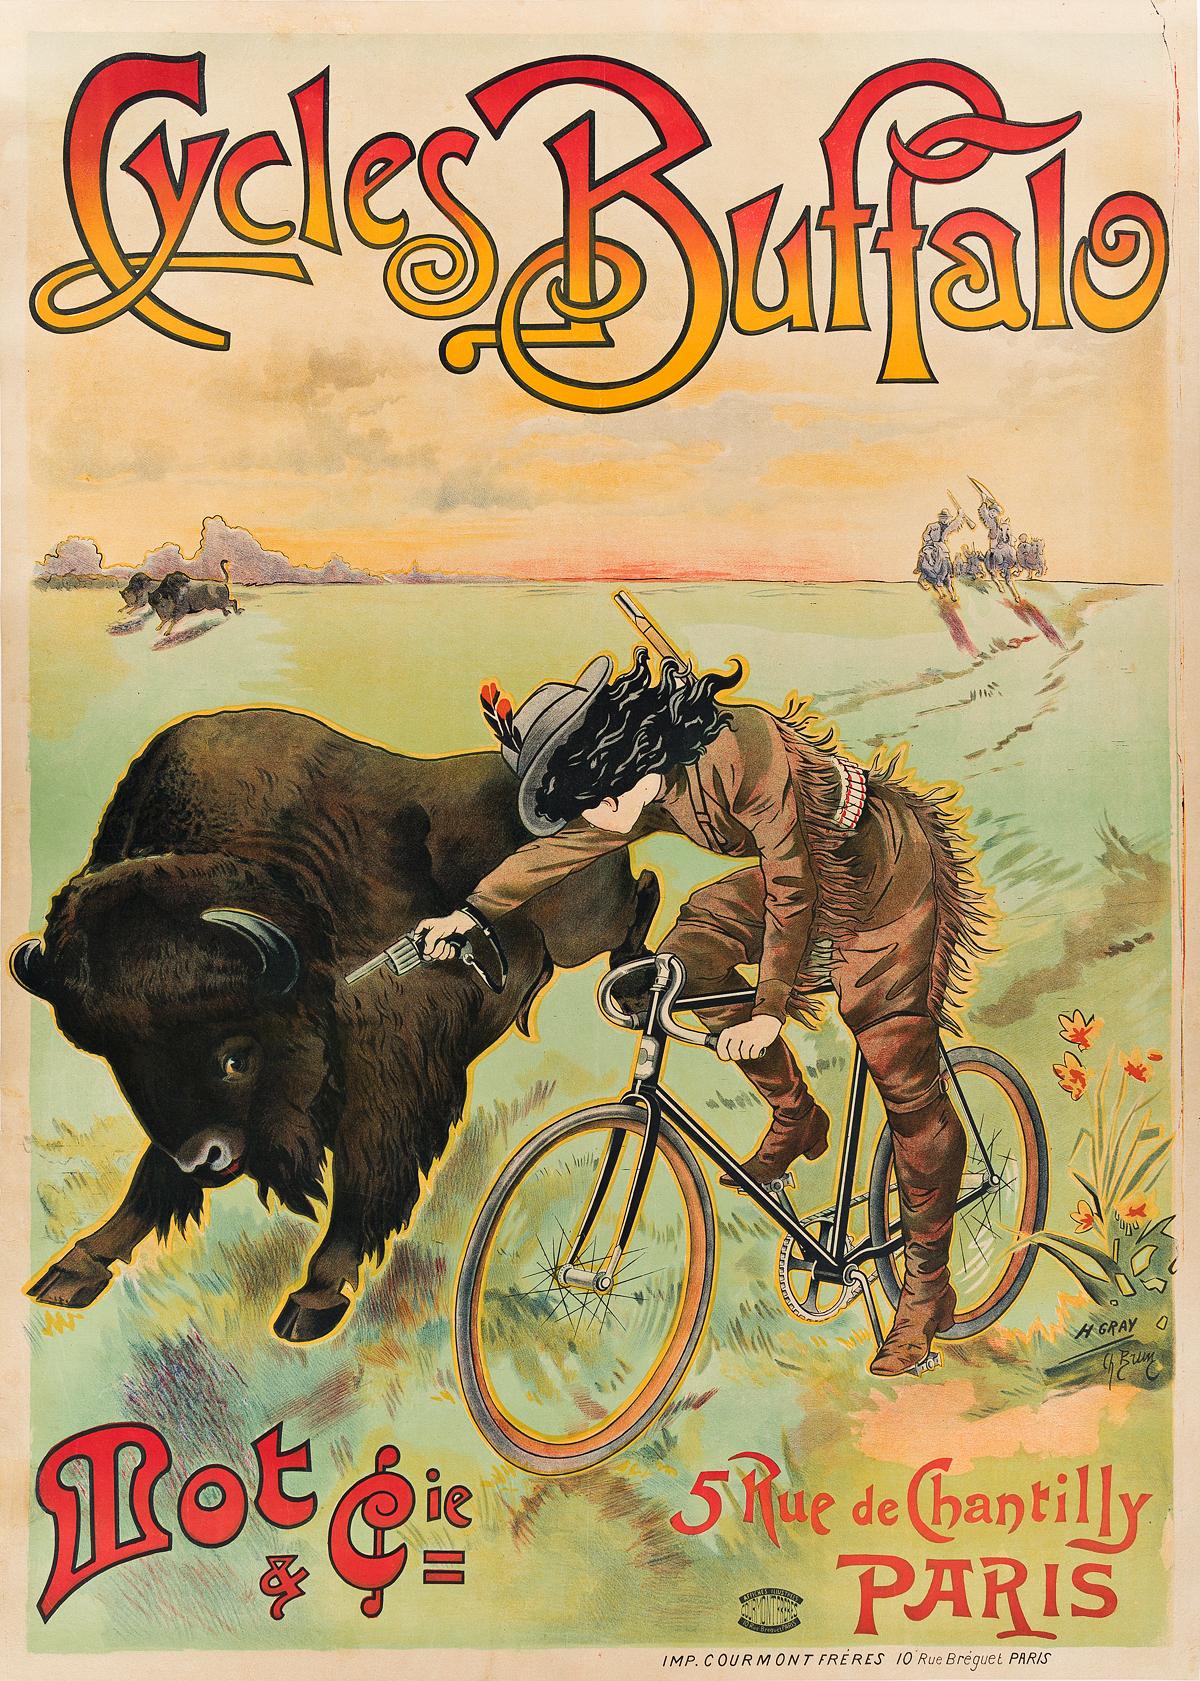 H. GRAY (HENRI BOULANGER, 1858-1924) & CHARLES BRUN (1825-1908). CYCLES BUFFALO. Circa 1902. 53x38 inches, 136x96 cm. Courmont Fréres,